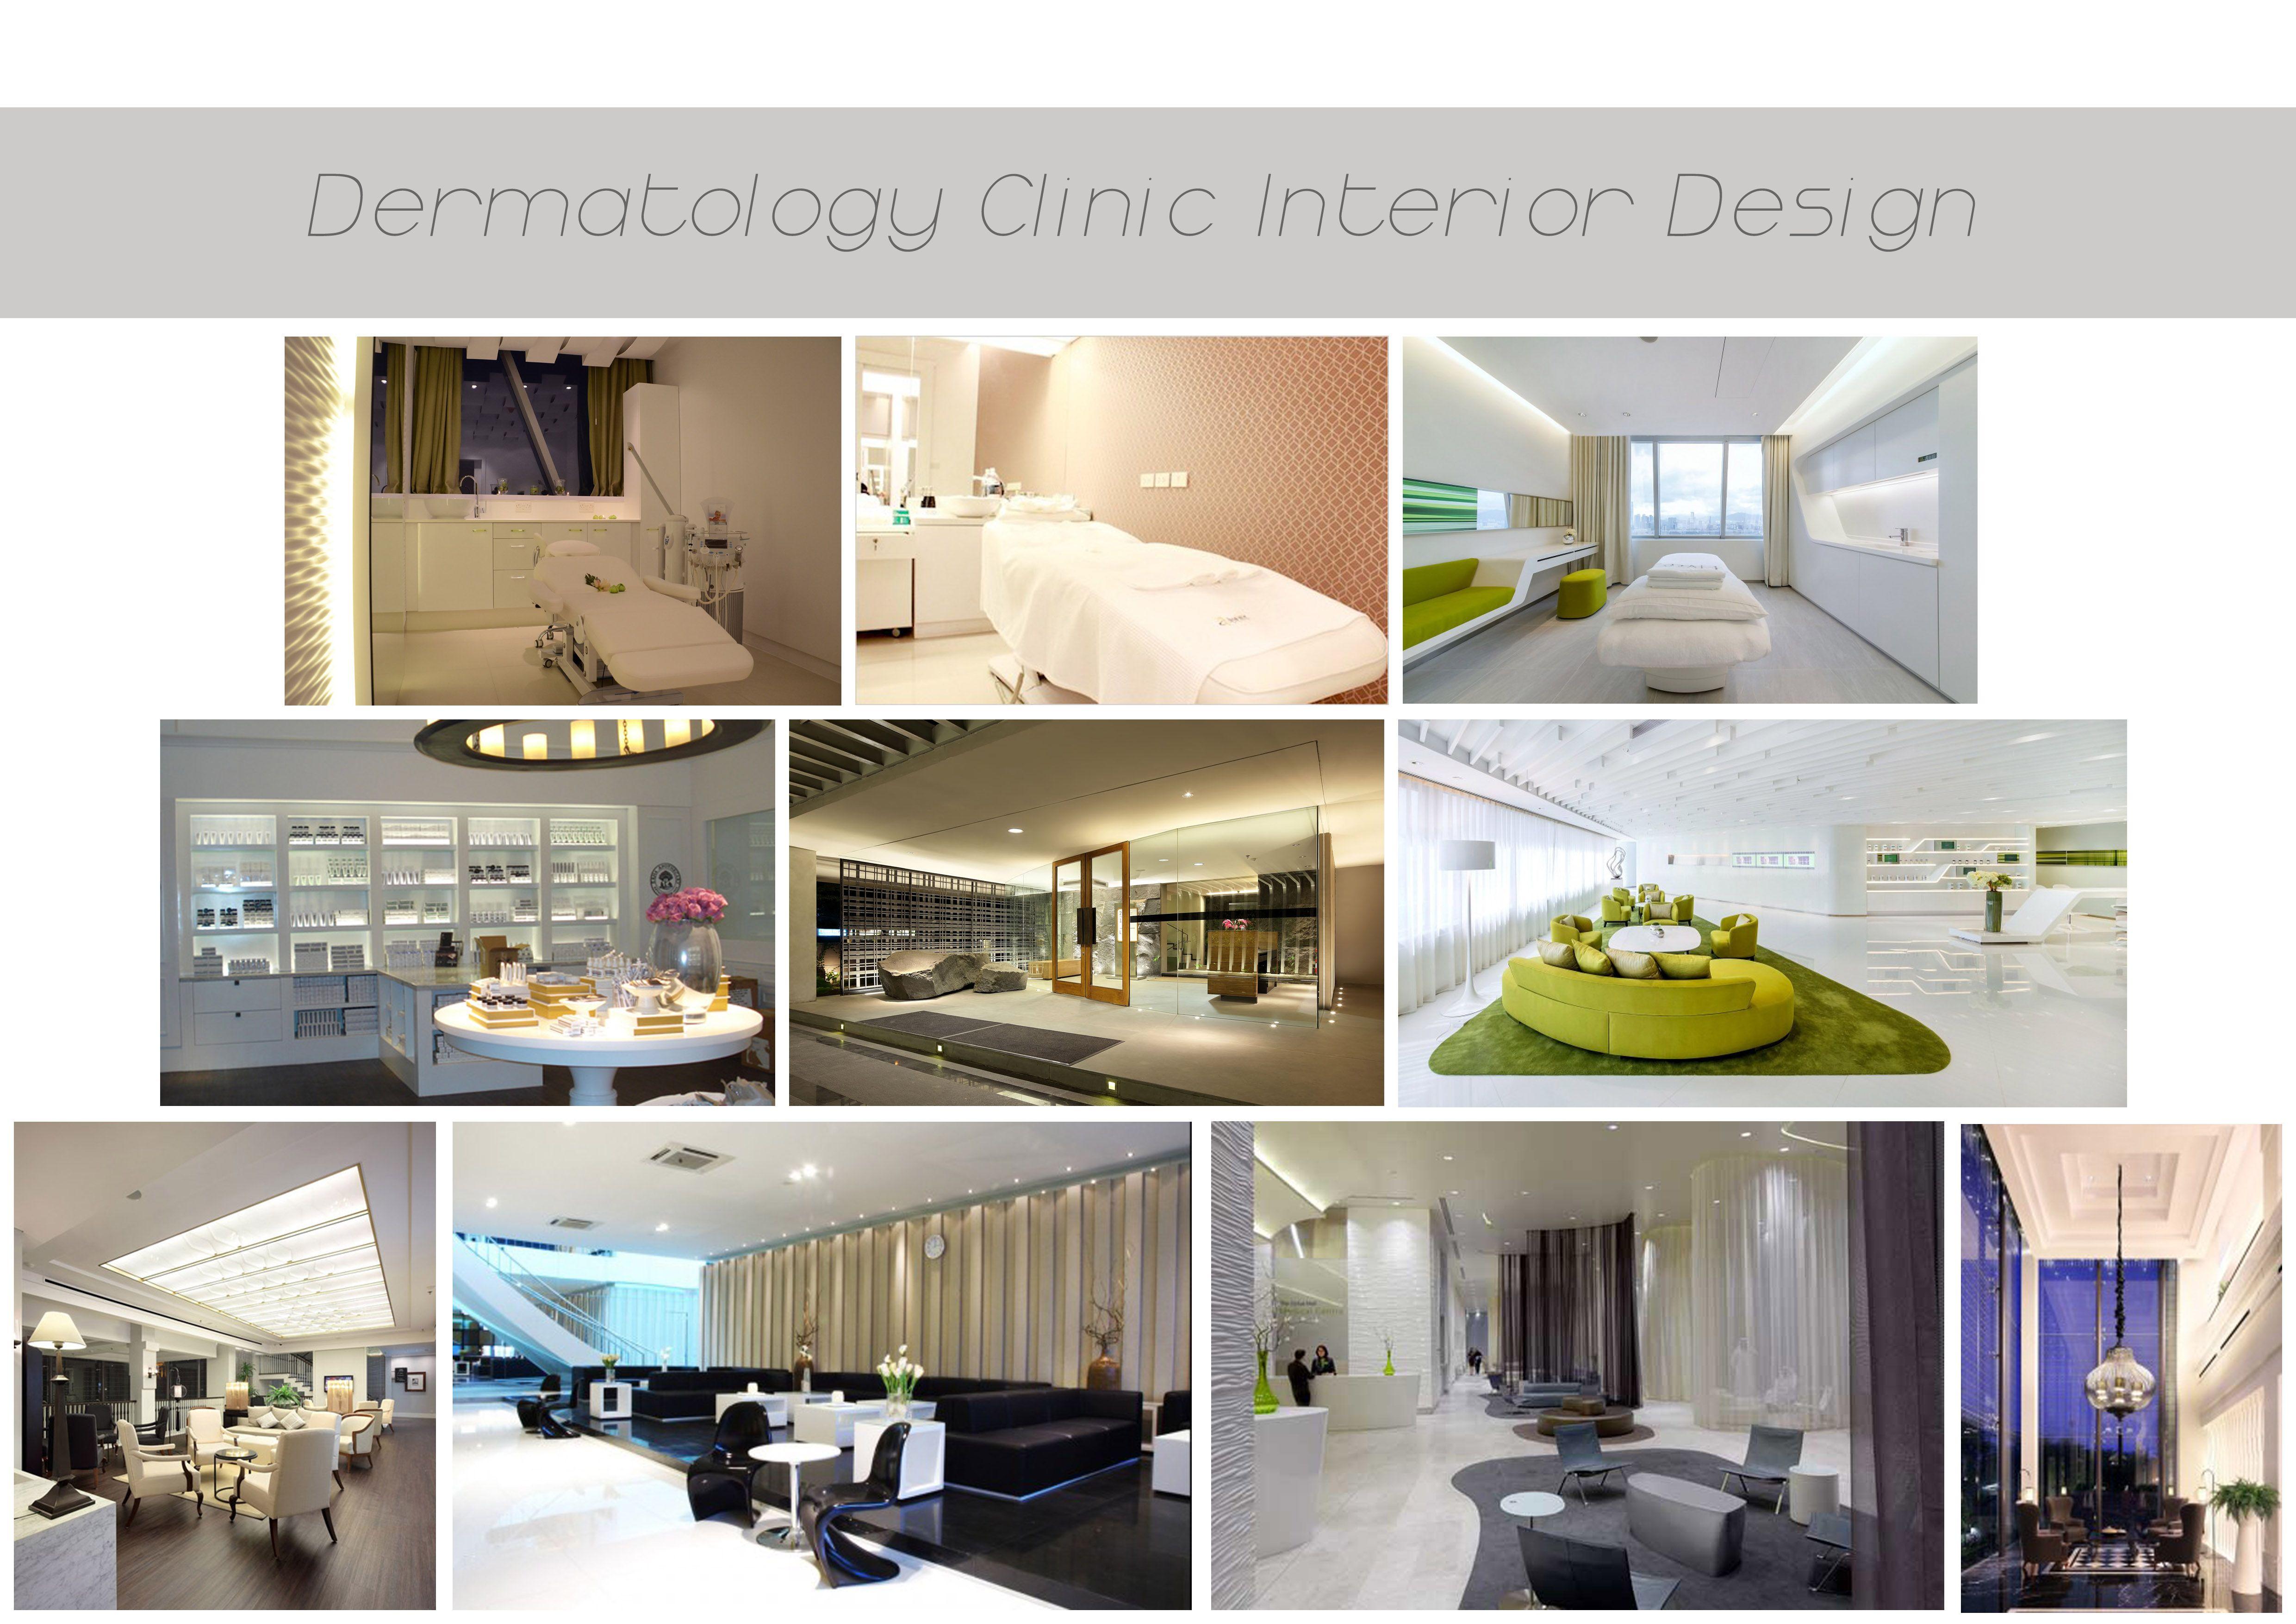 Dermatology Clinic Interior Design Ideas Ideas For The House Pinterest Clinic Interior Design